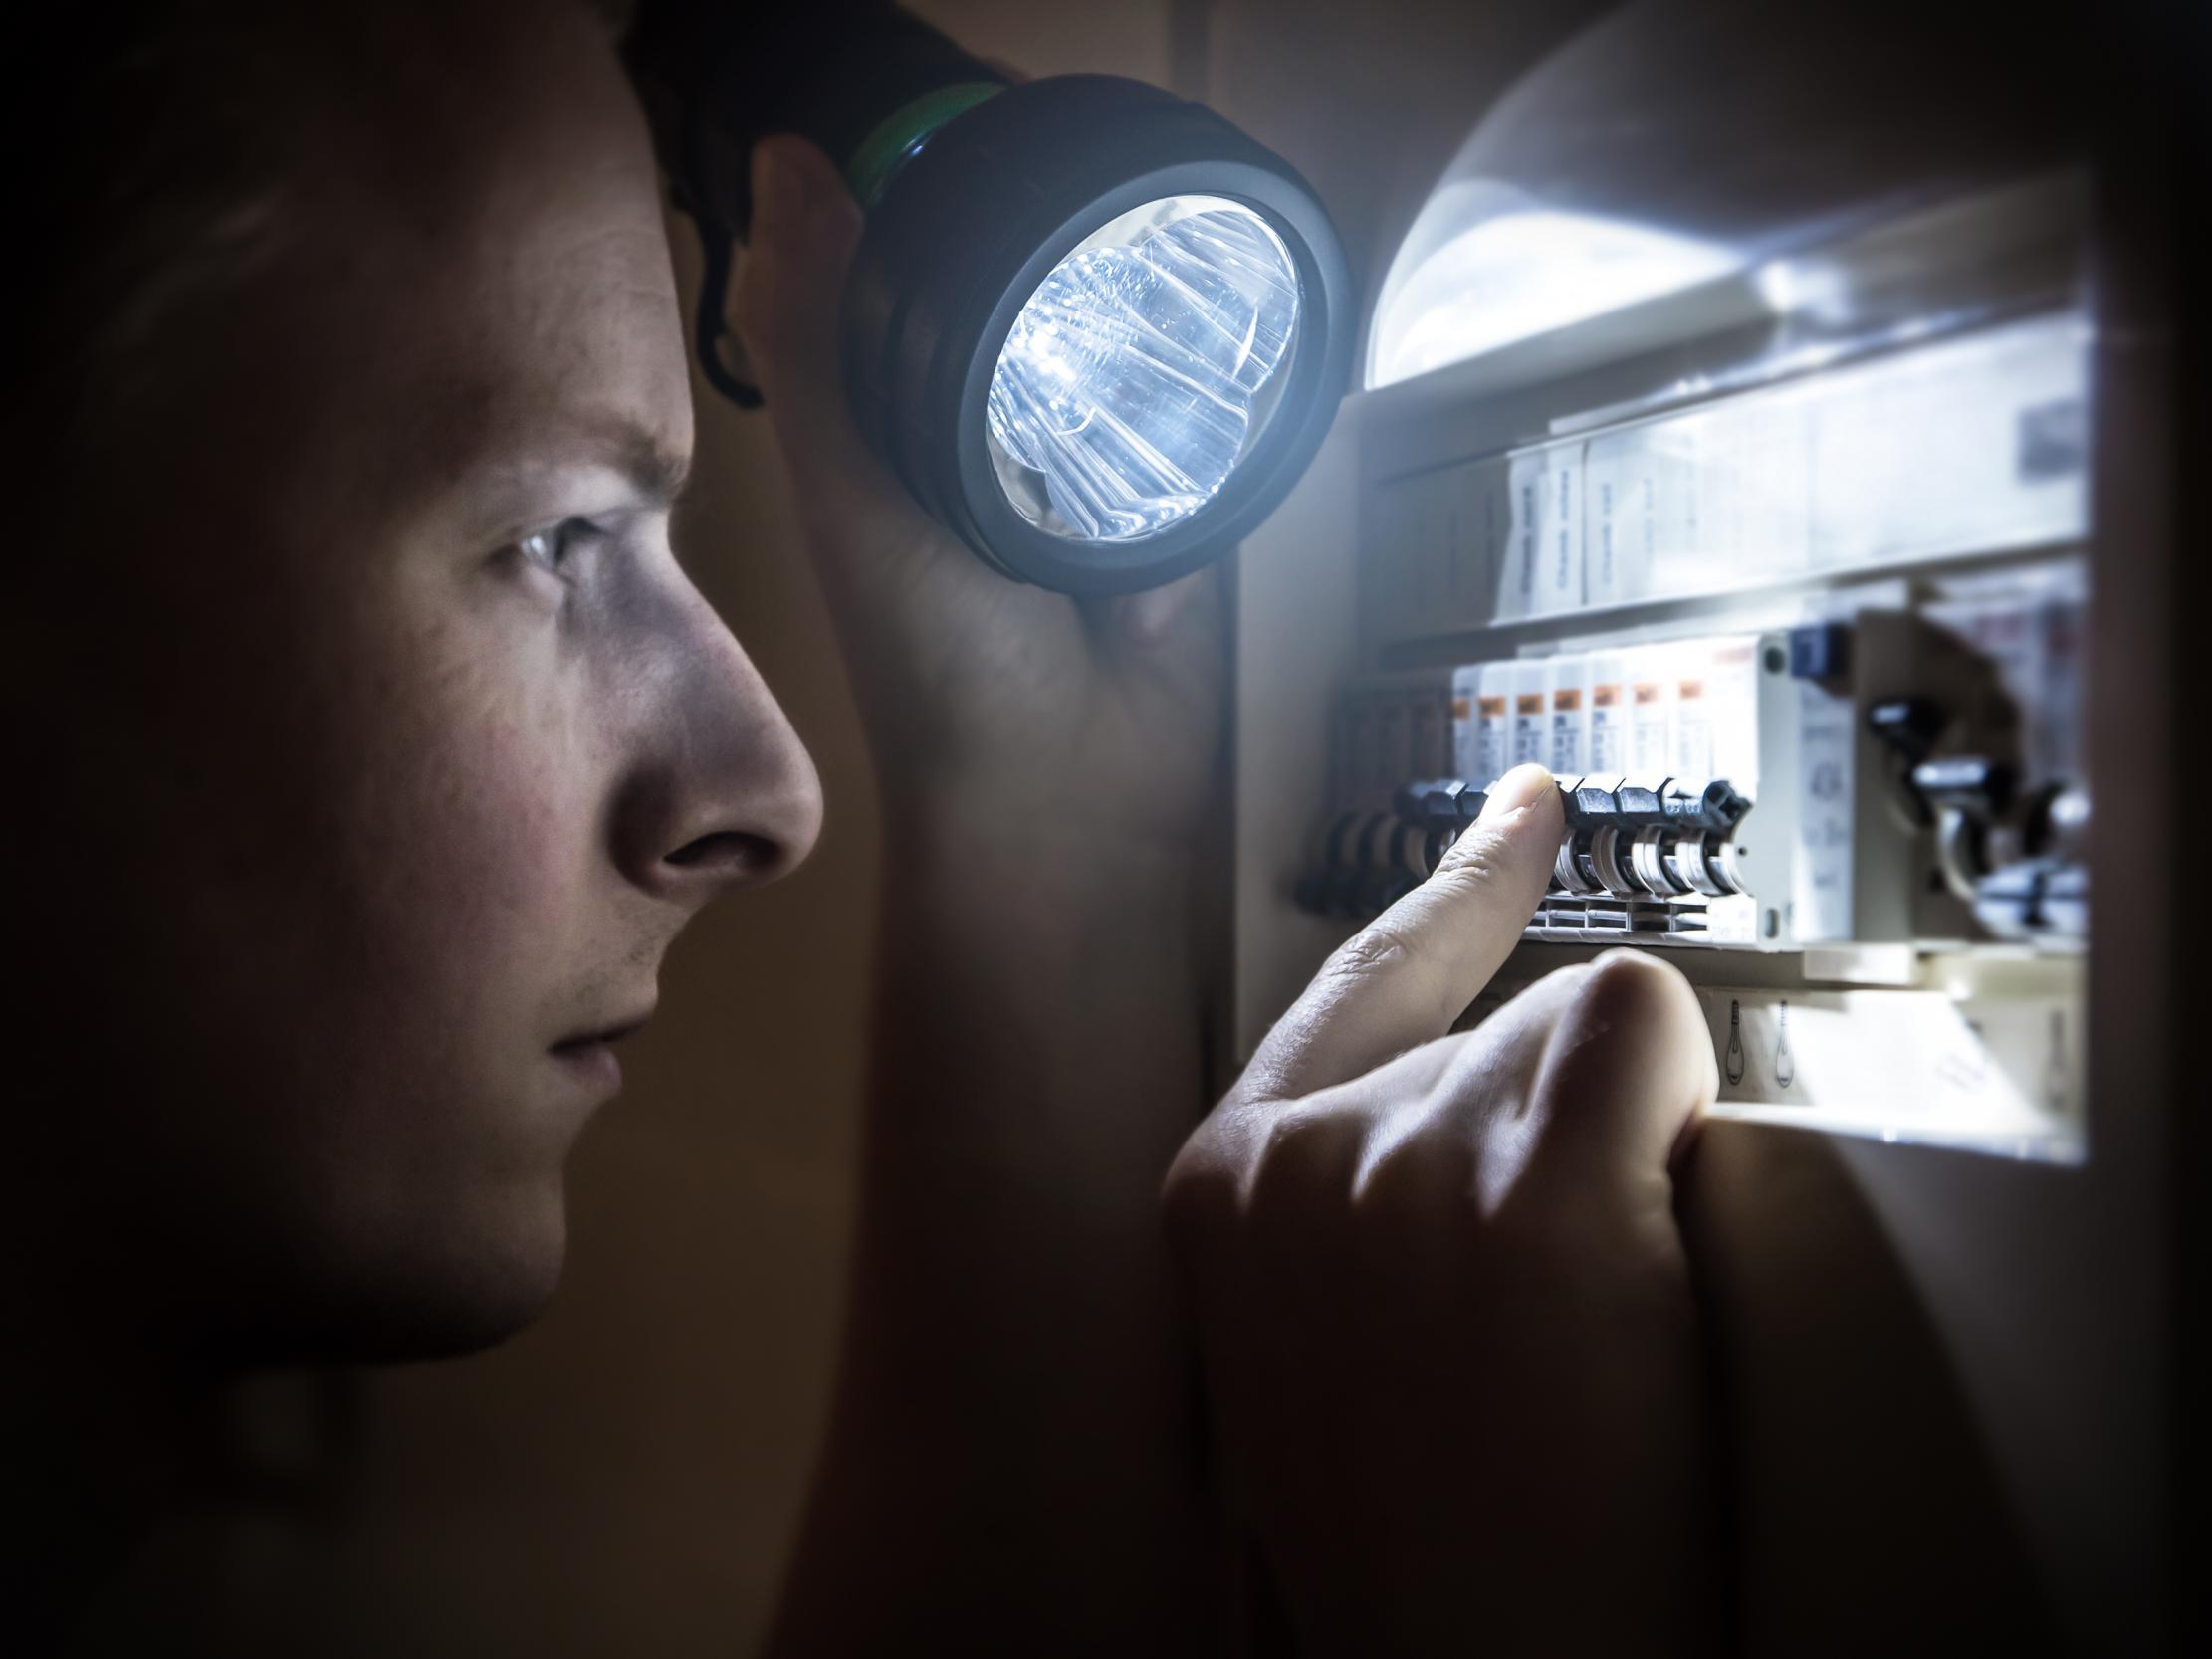 British households told to prepare for blackouts as coronavirus lockdown goes on